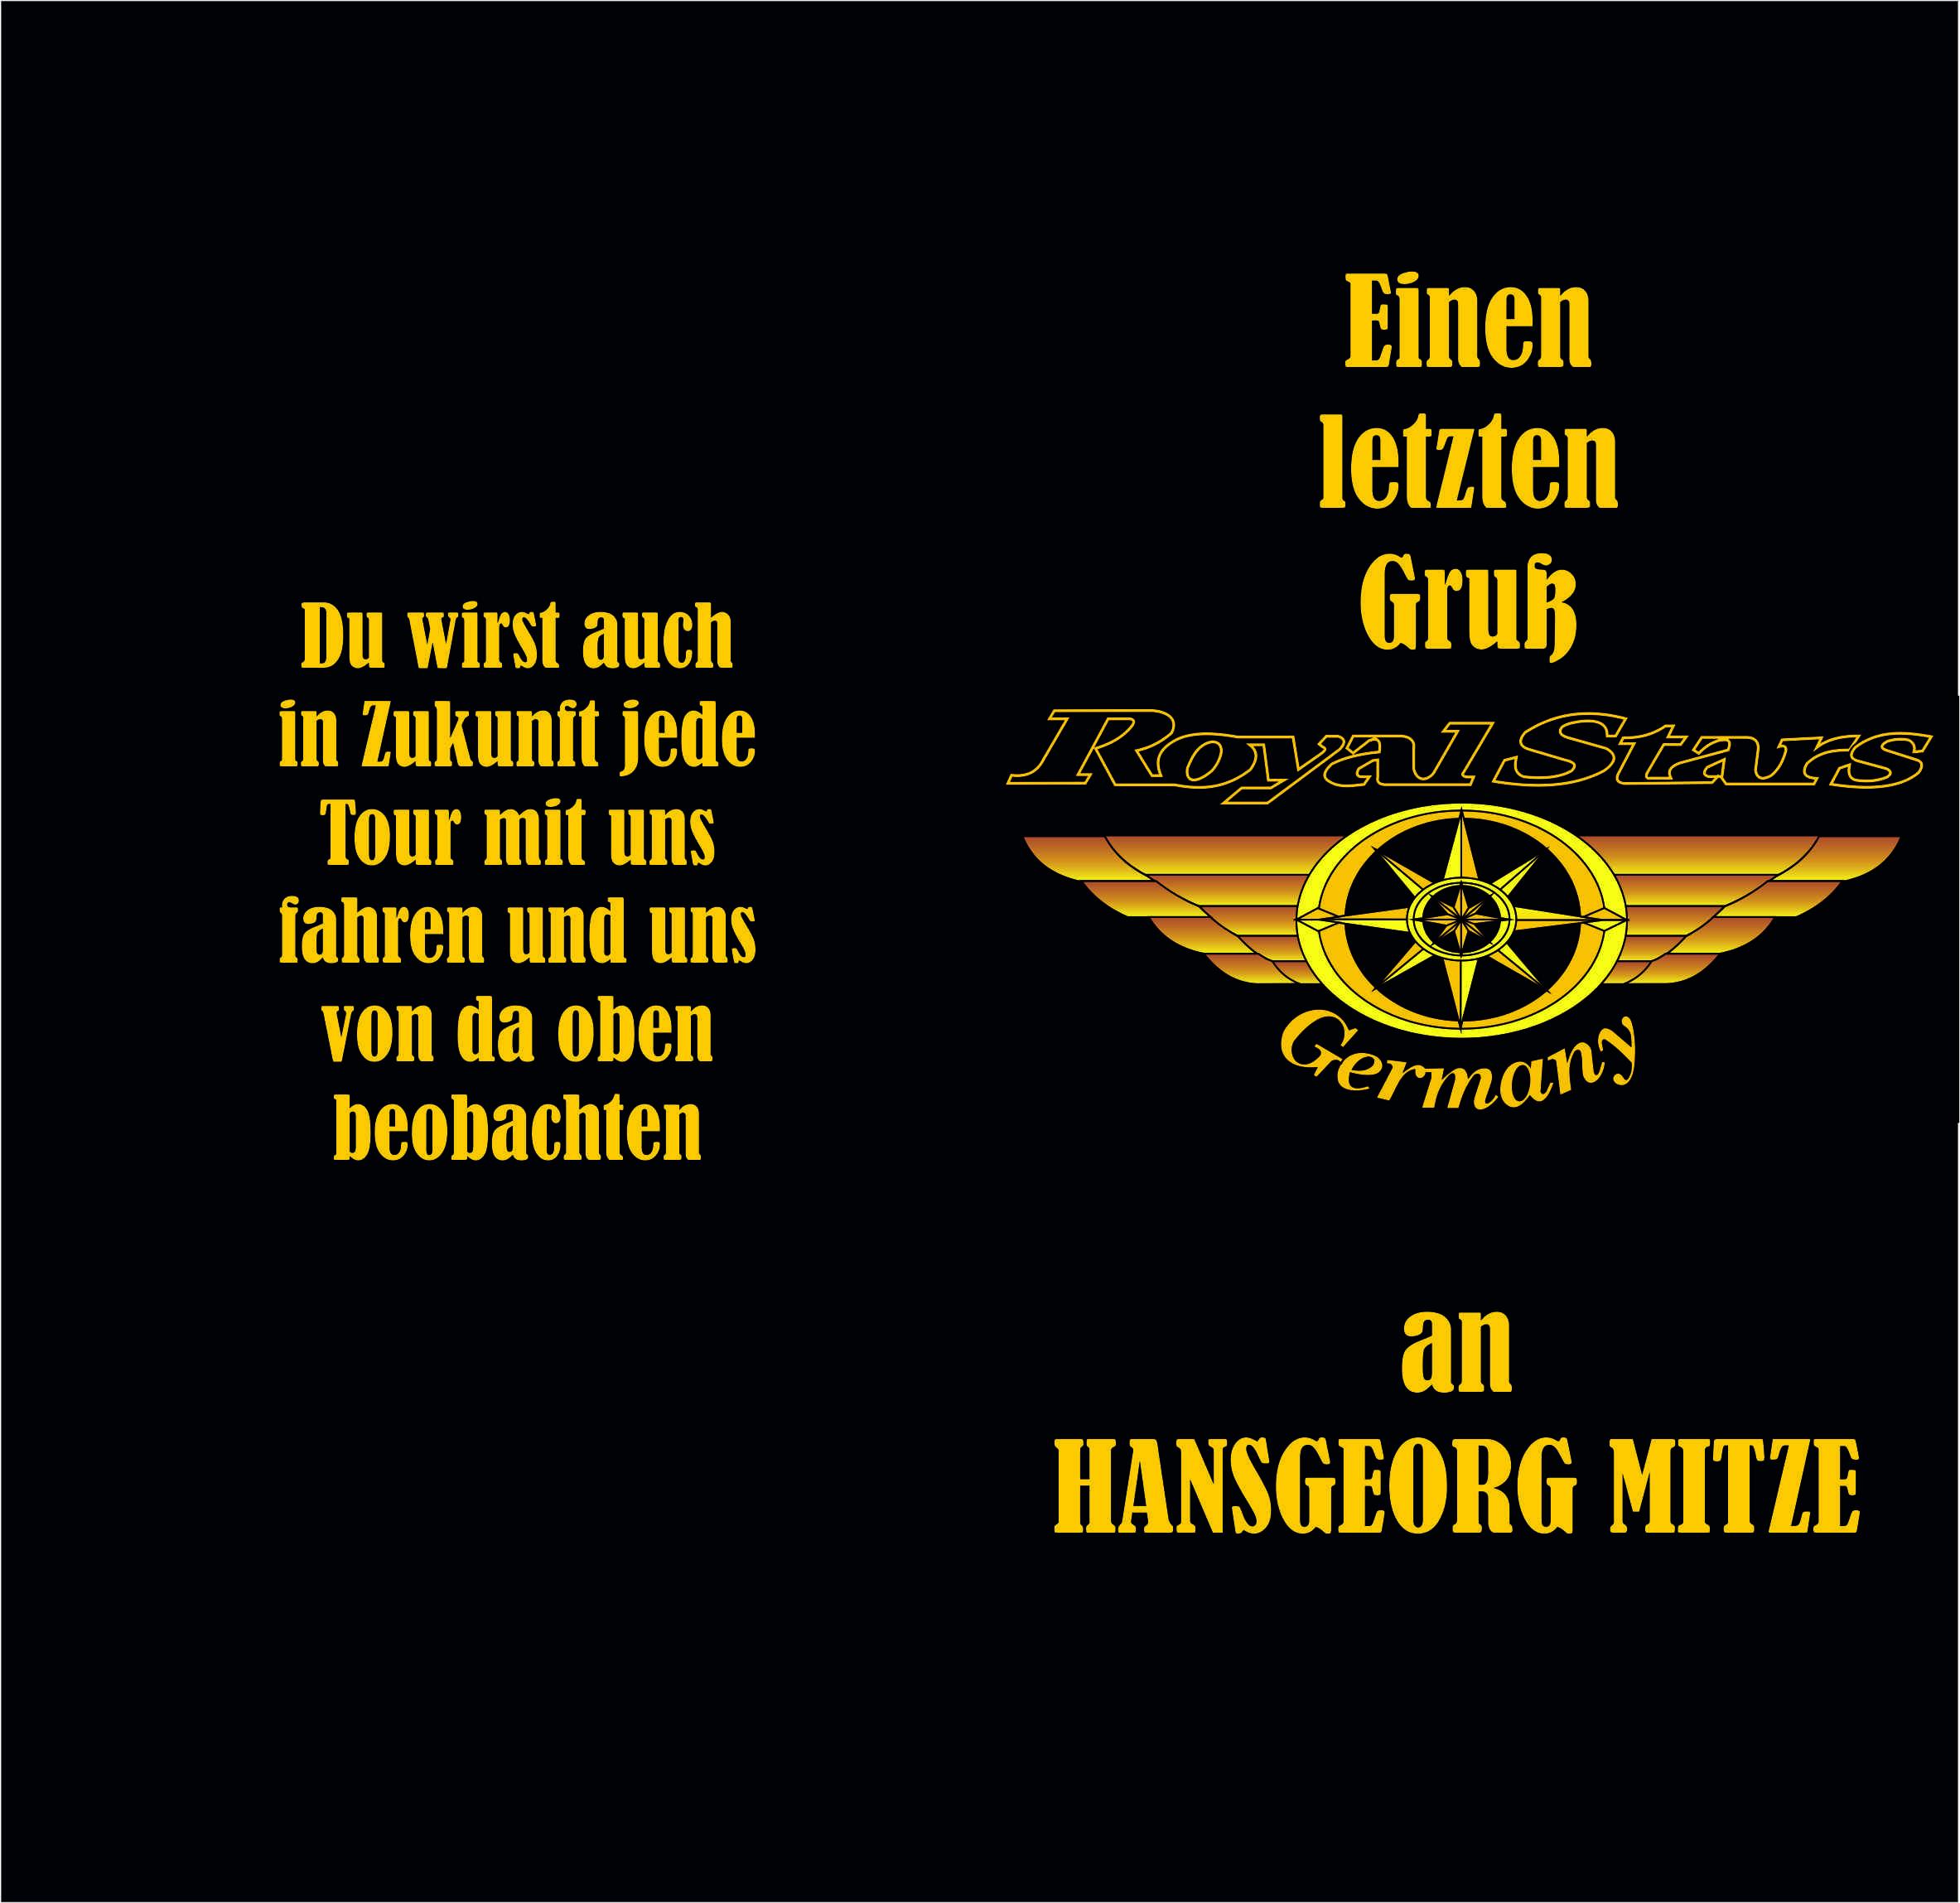 trauerkarte-hansgeorg mitze-2